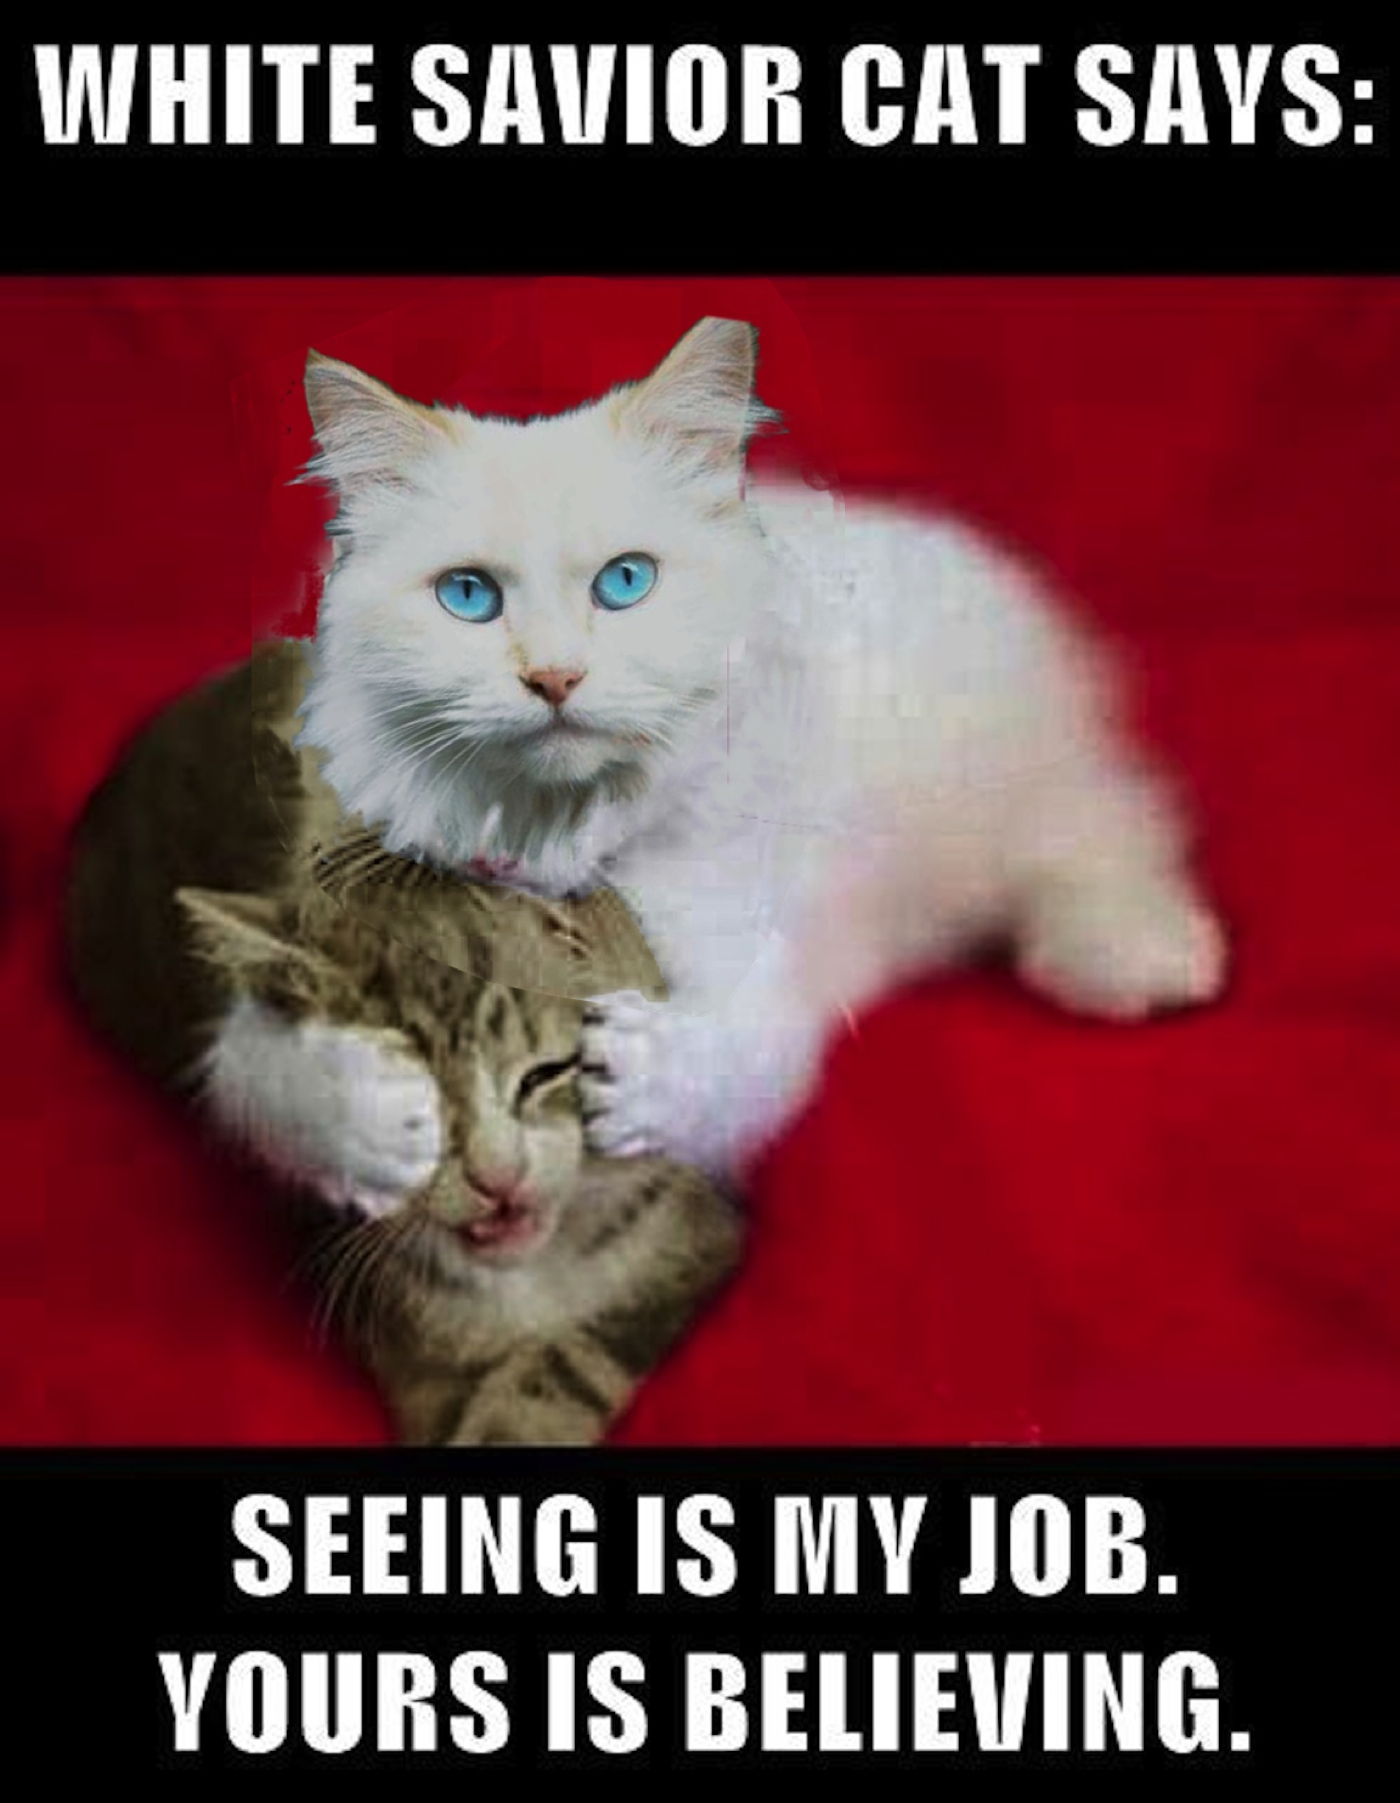 White Savior Cat on the Enligh...